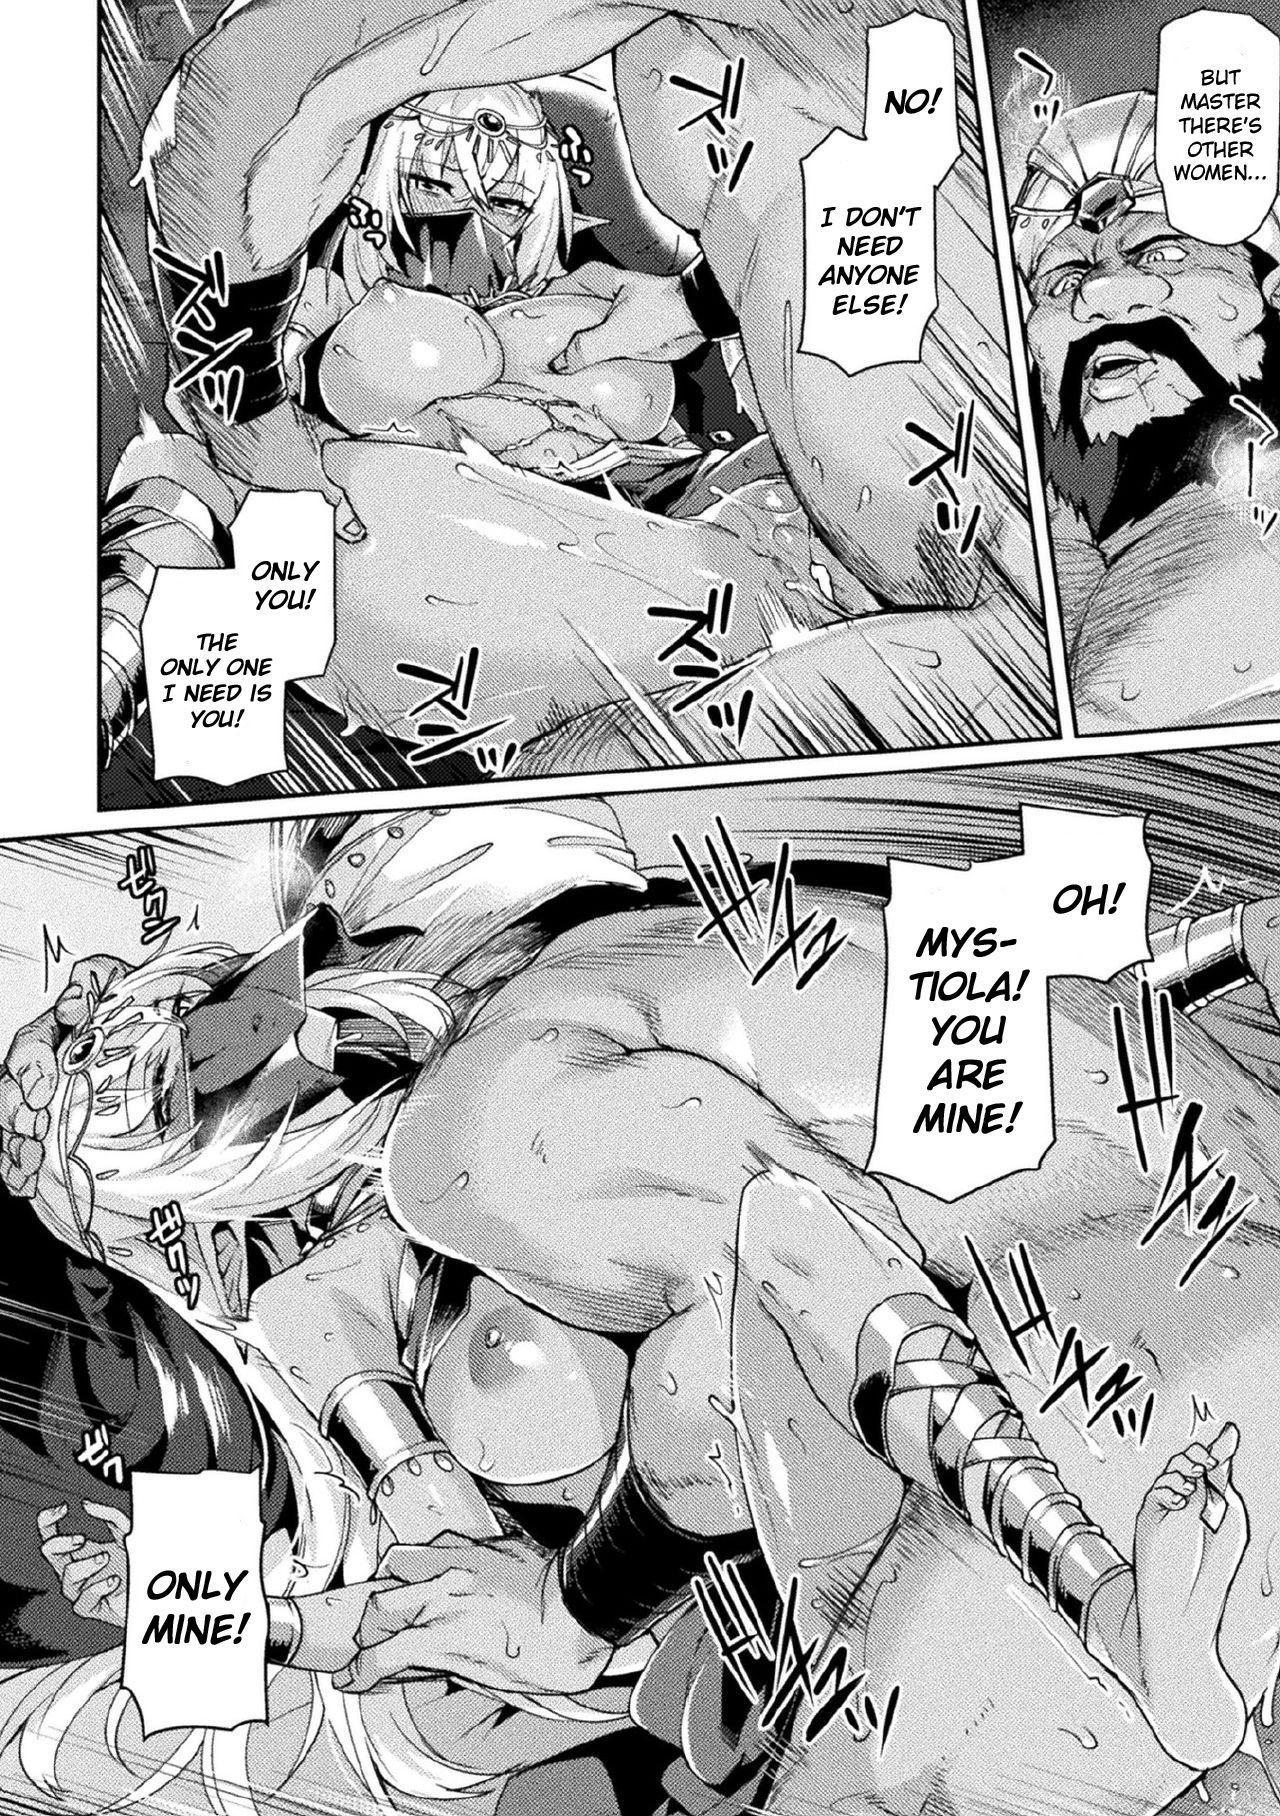 [Tsukitokage] Kuroinu II ~Inyoku ni Somaru Haitoku no Miyako, Futatabi~ THE COMIC Chapter 6 (Kukkoro Heroines Vol. 7) [English] [Klub Kemoner] [Decensored] [Digital] 1